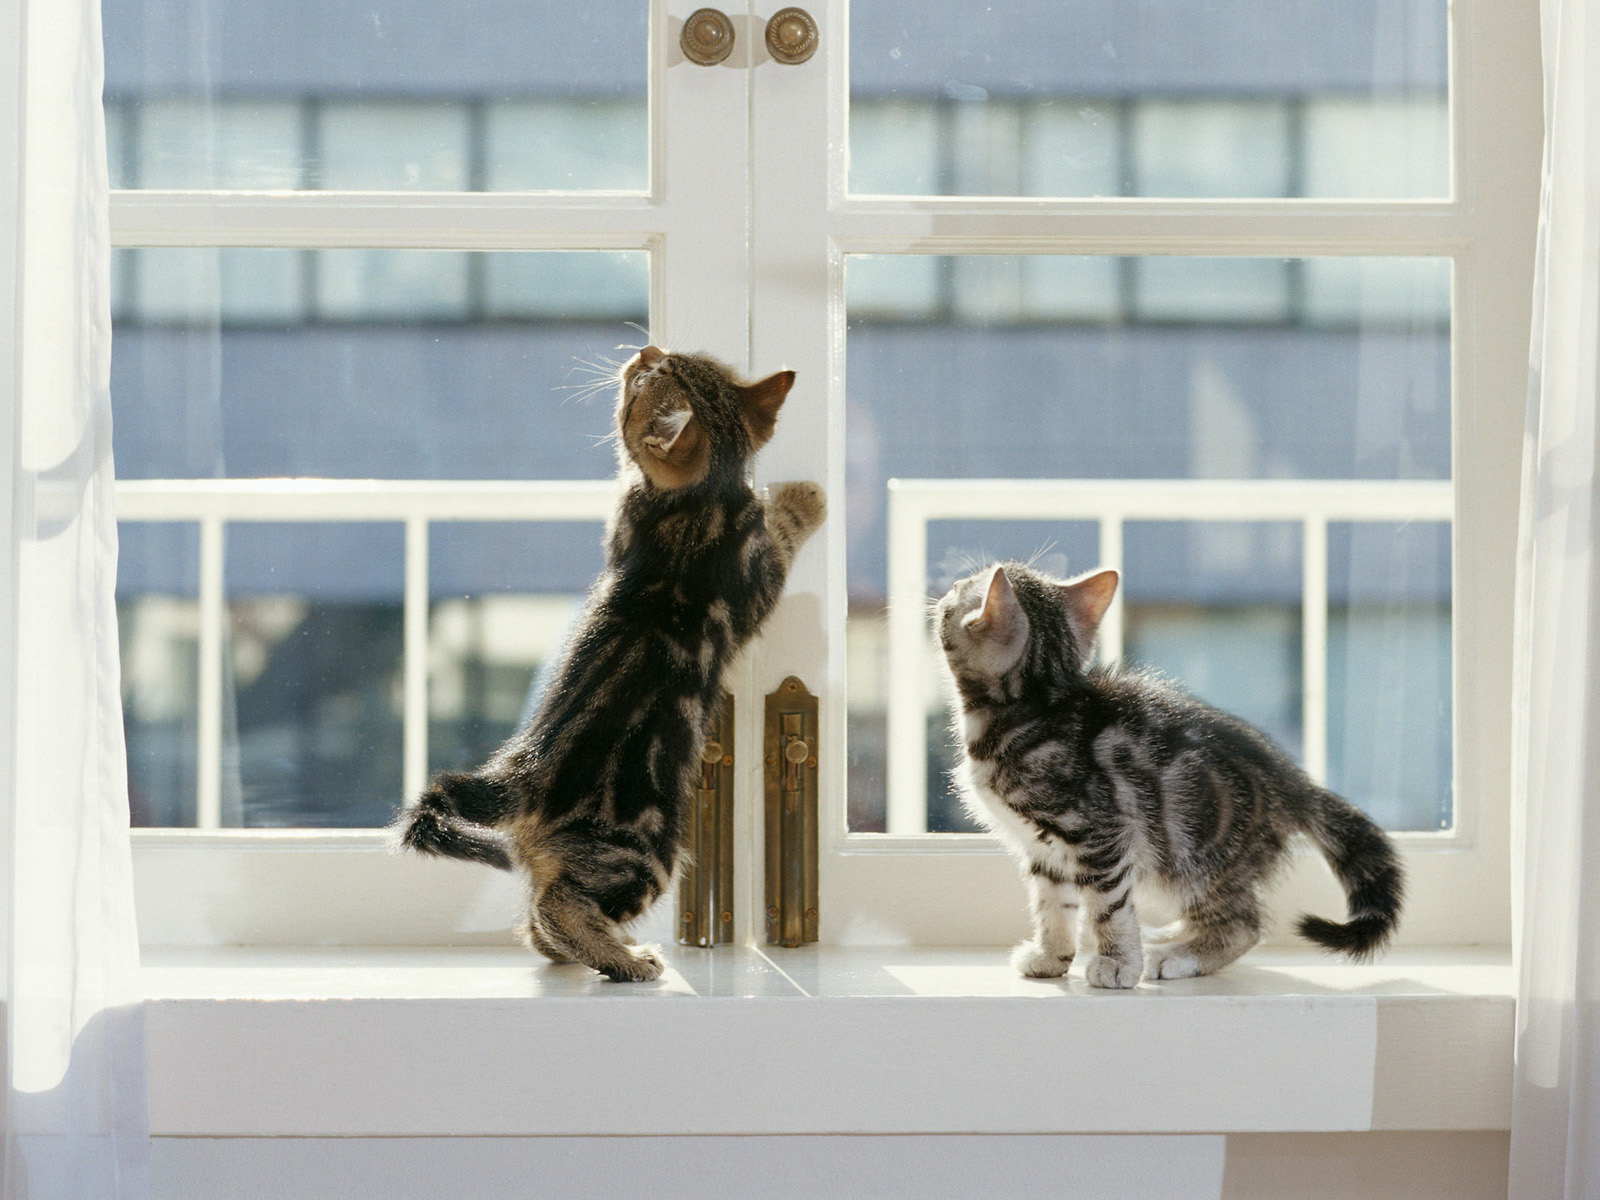 котята на окне kittens on the window  № 3063254 бесплатно